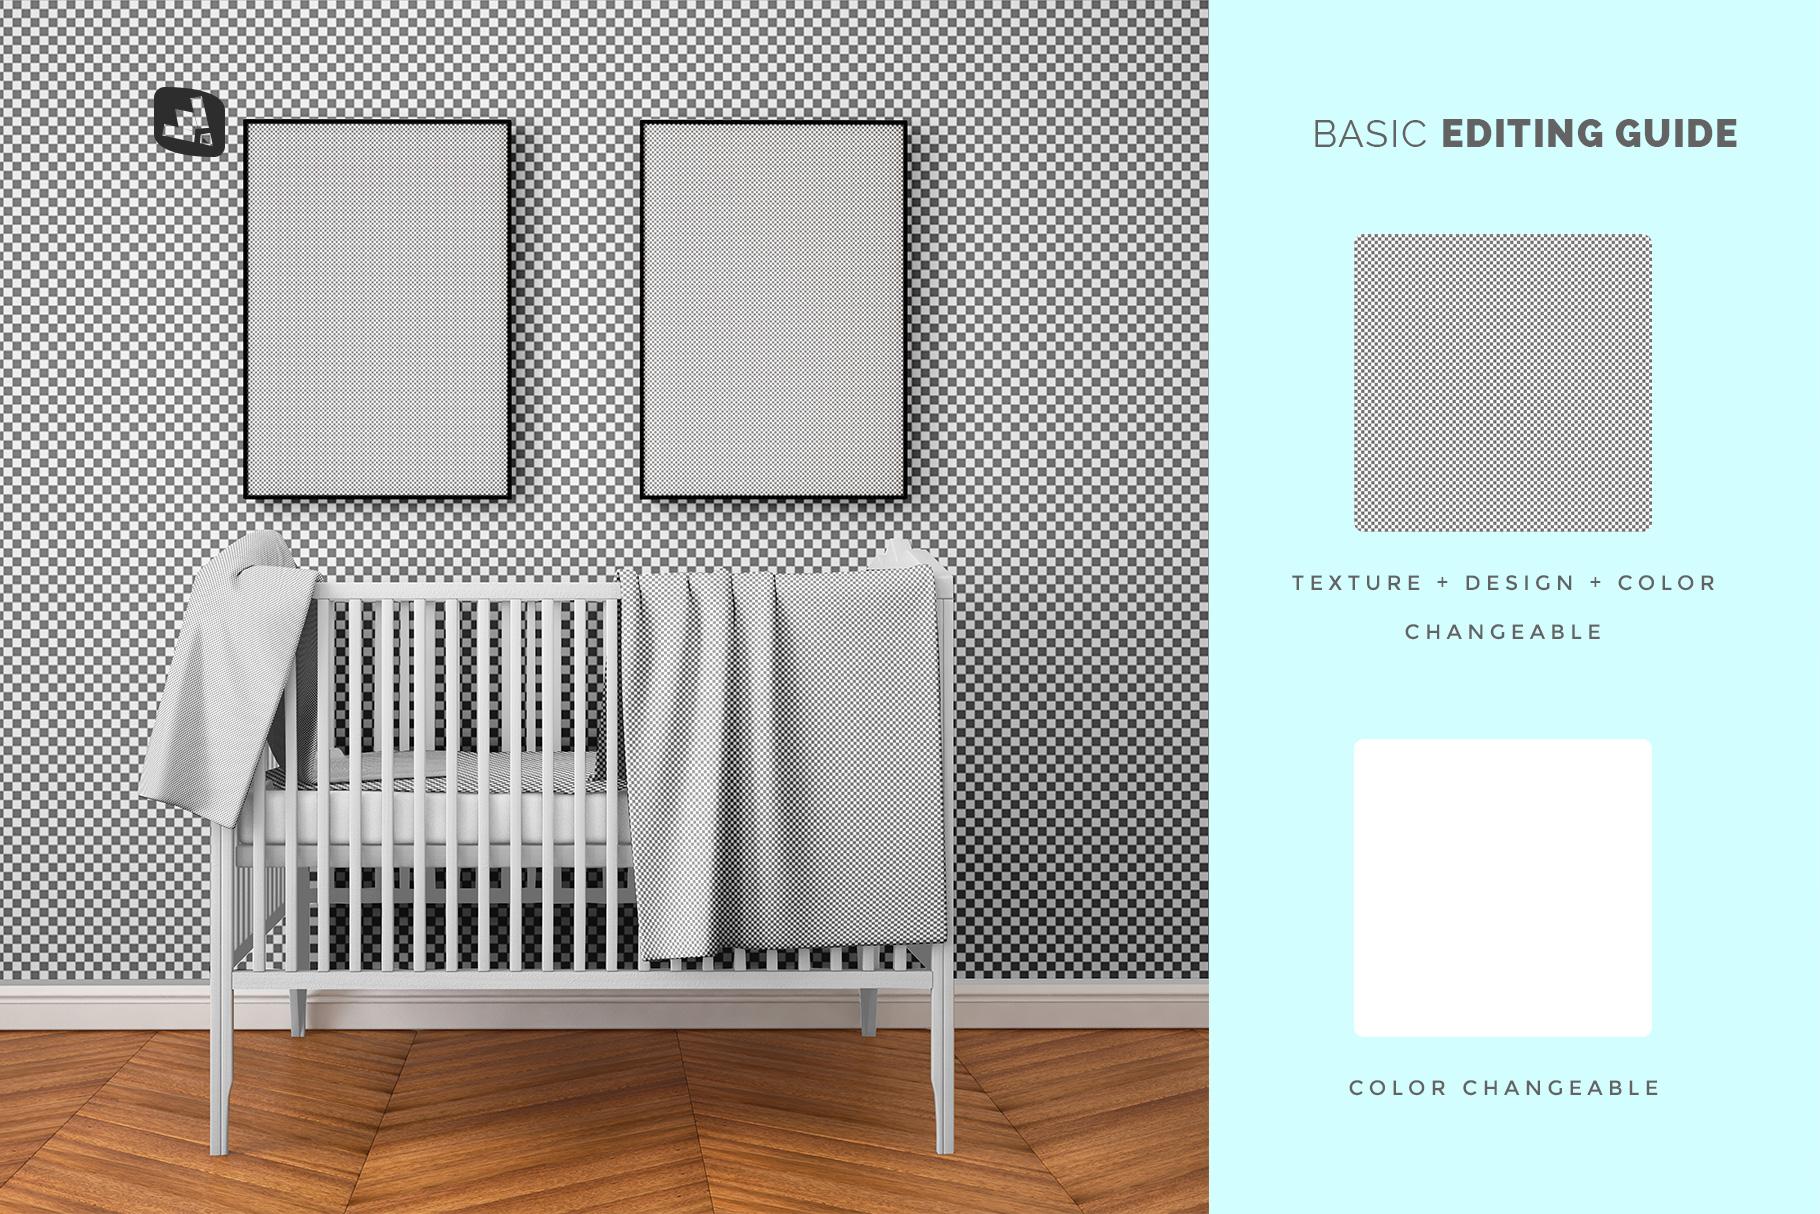 editability of the nursery interior mockup